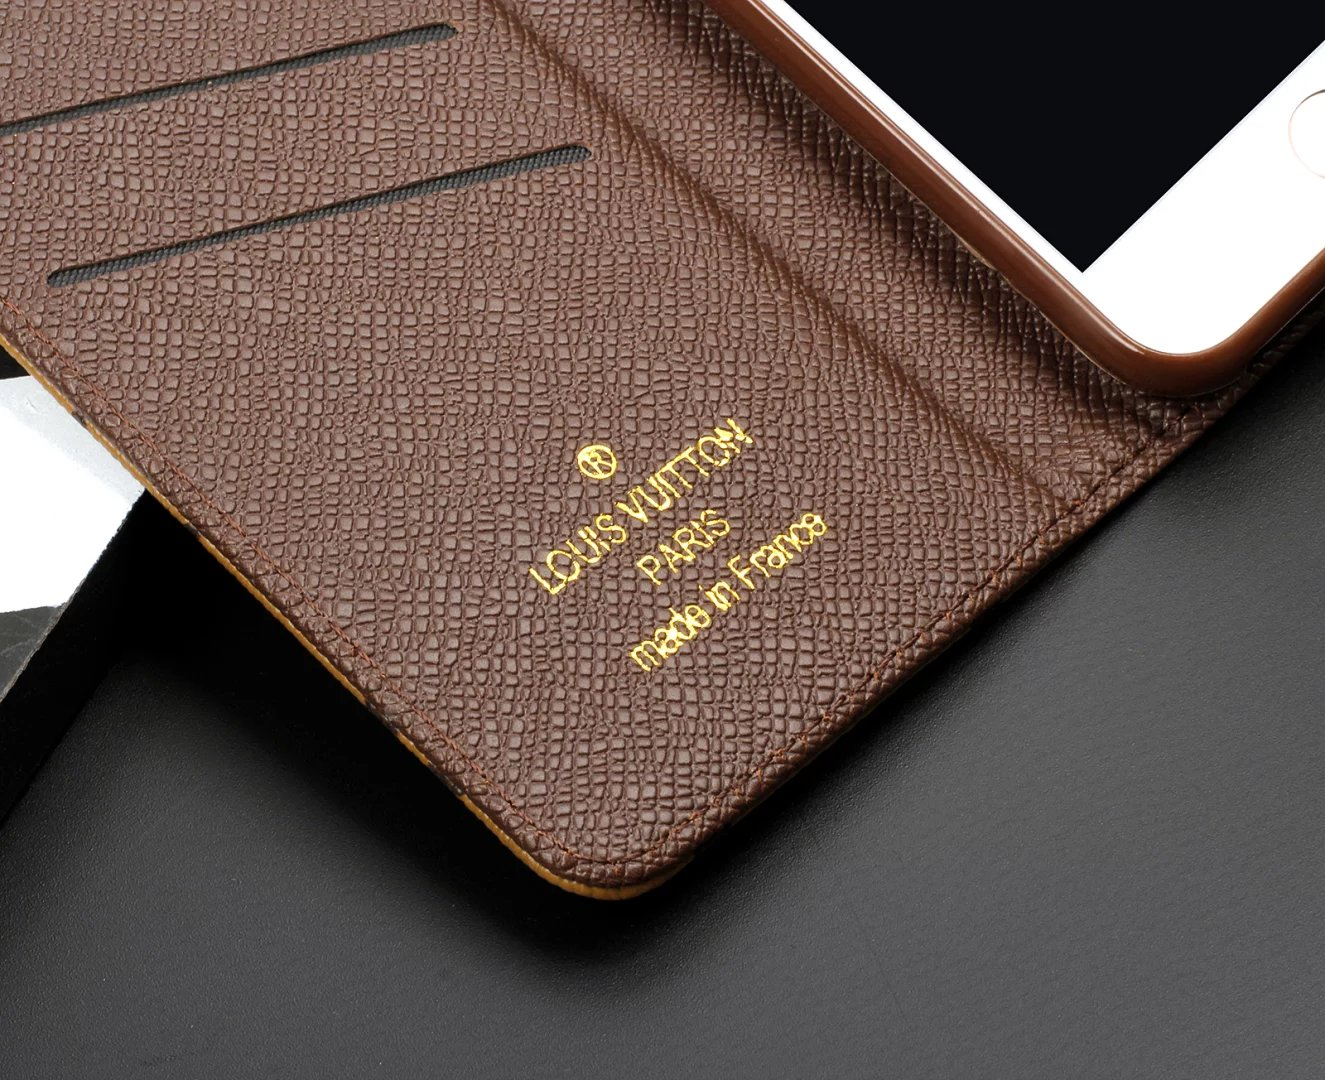 iphone hülle online shop iphone hülle individuell Louis Vuitton iphone6 plus hülle handy etui 6lbst gestalten handyhüllen anfertigen las6n iphone bumper 6lbst gestalten handyschale mit foto handy tasche iphone 6 Plus mumbi iphone 6 Plus